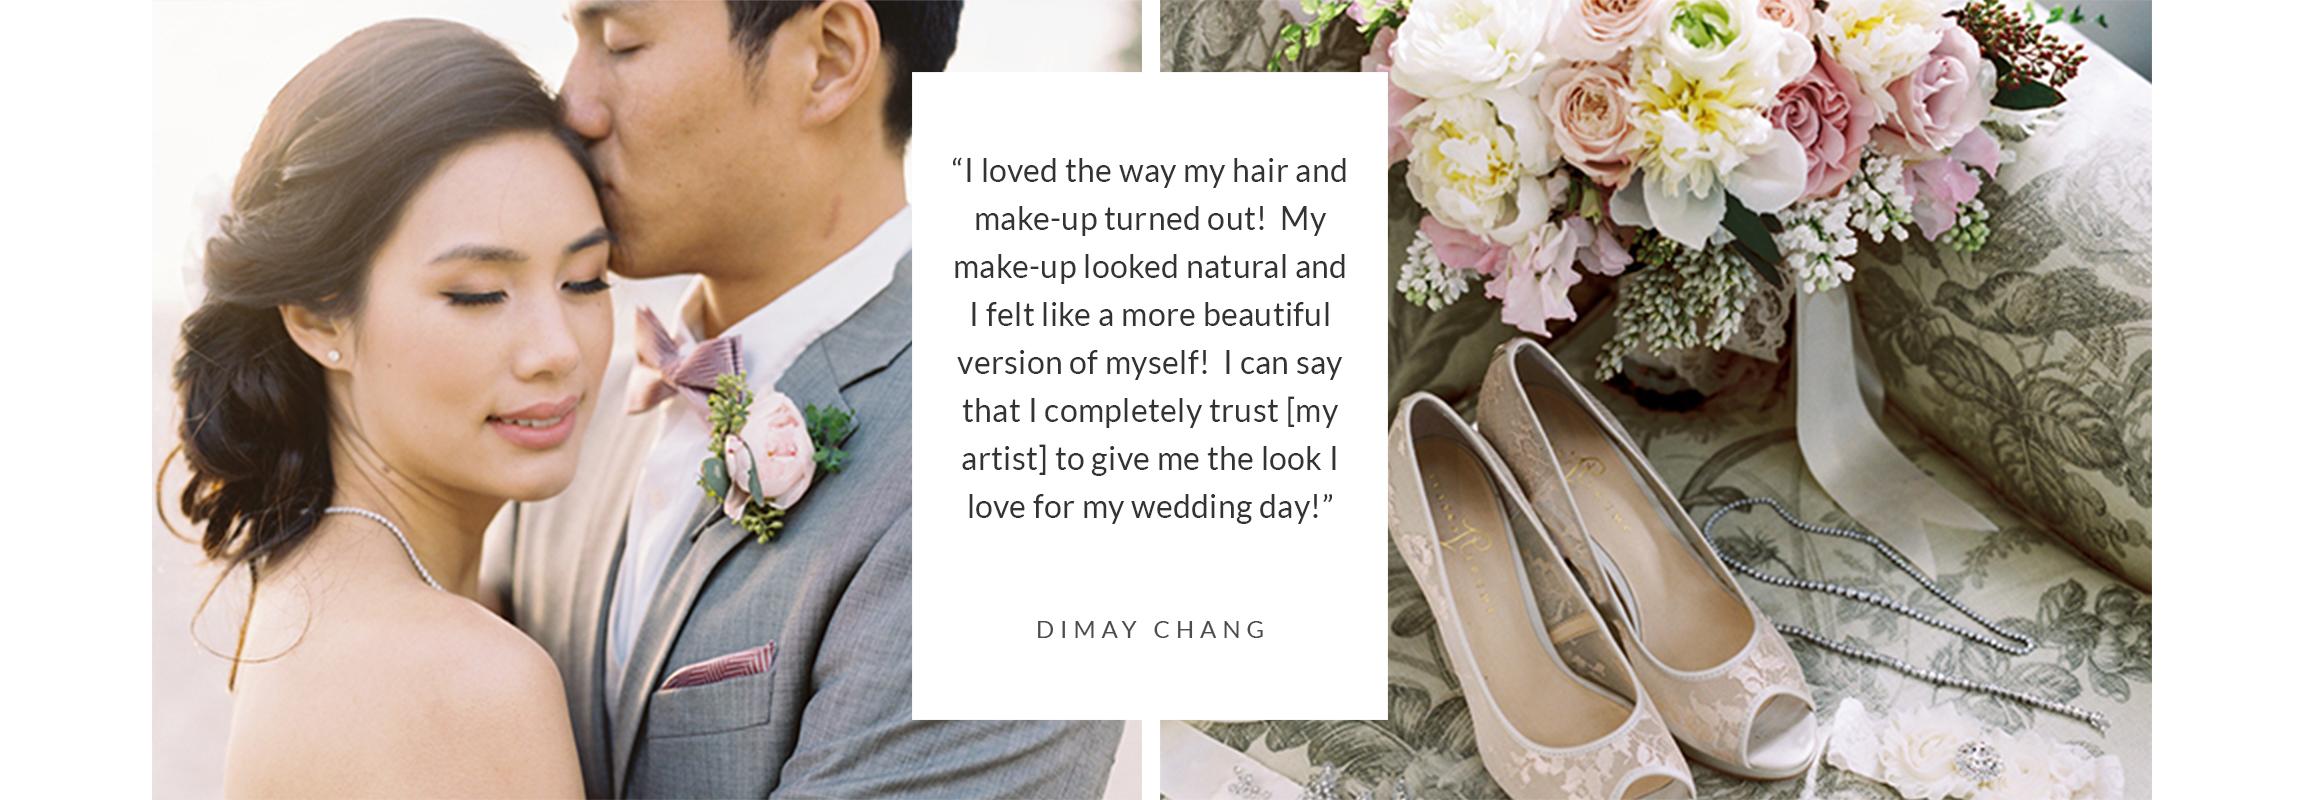 Dimay_Praise_800.jpg